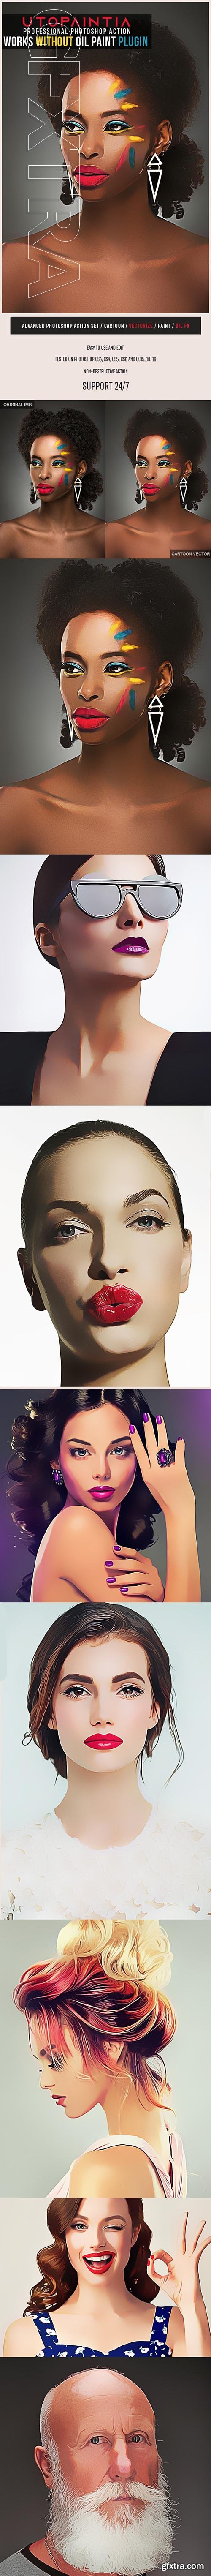 GraphicRiver - Utopaintia Photoshop Action 25212076